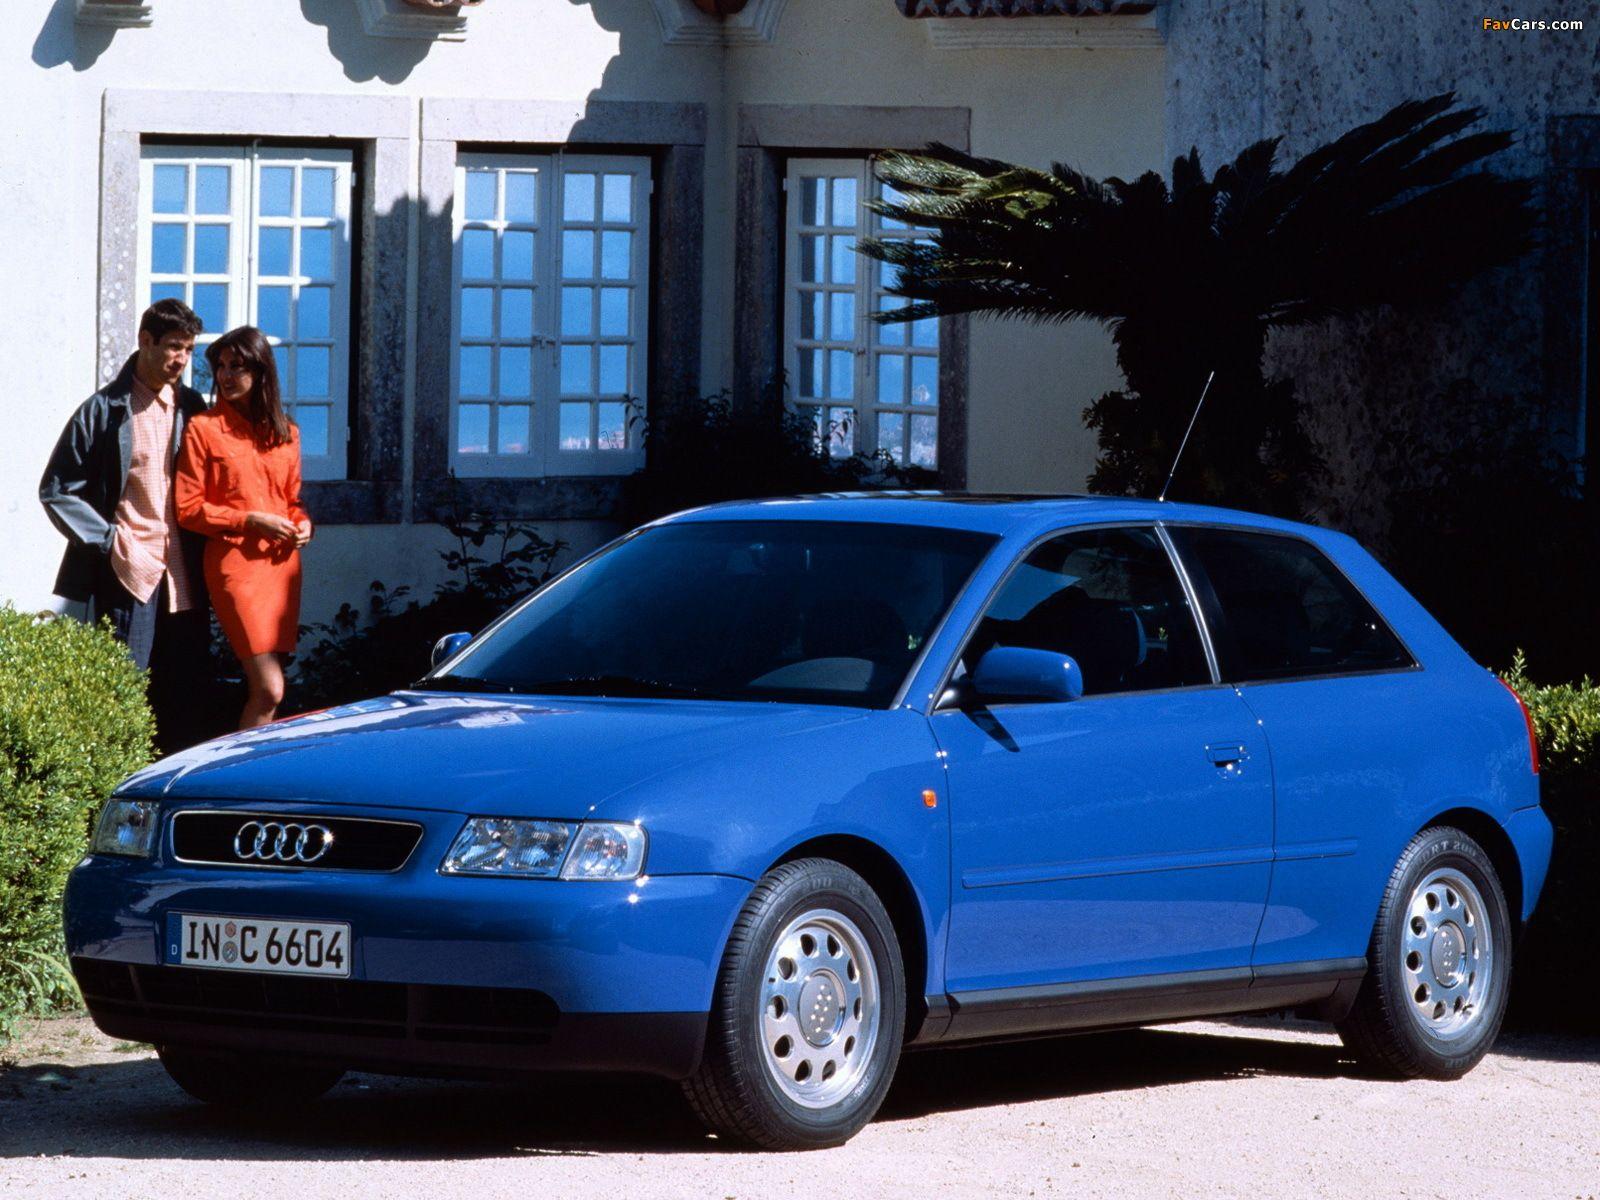 Wallpapers Of Audi A3 8l 1996 2000 Audi Audi A3 Suv